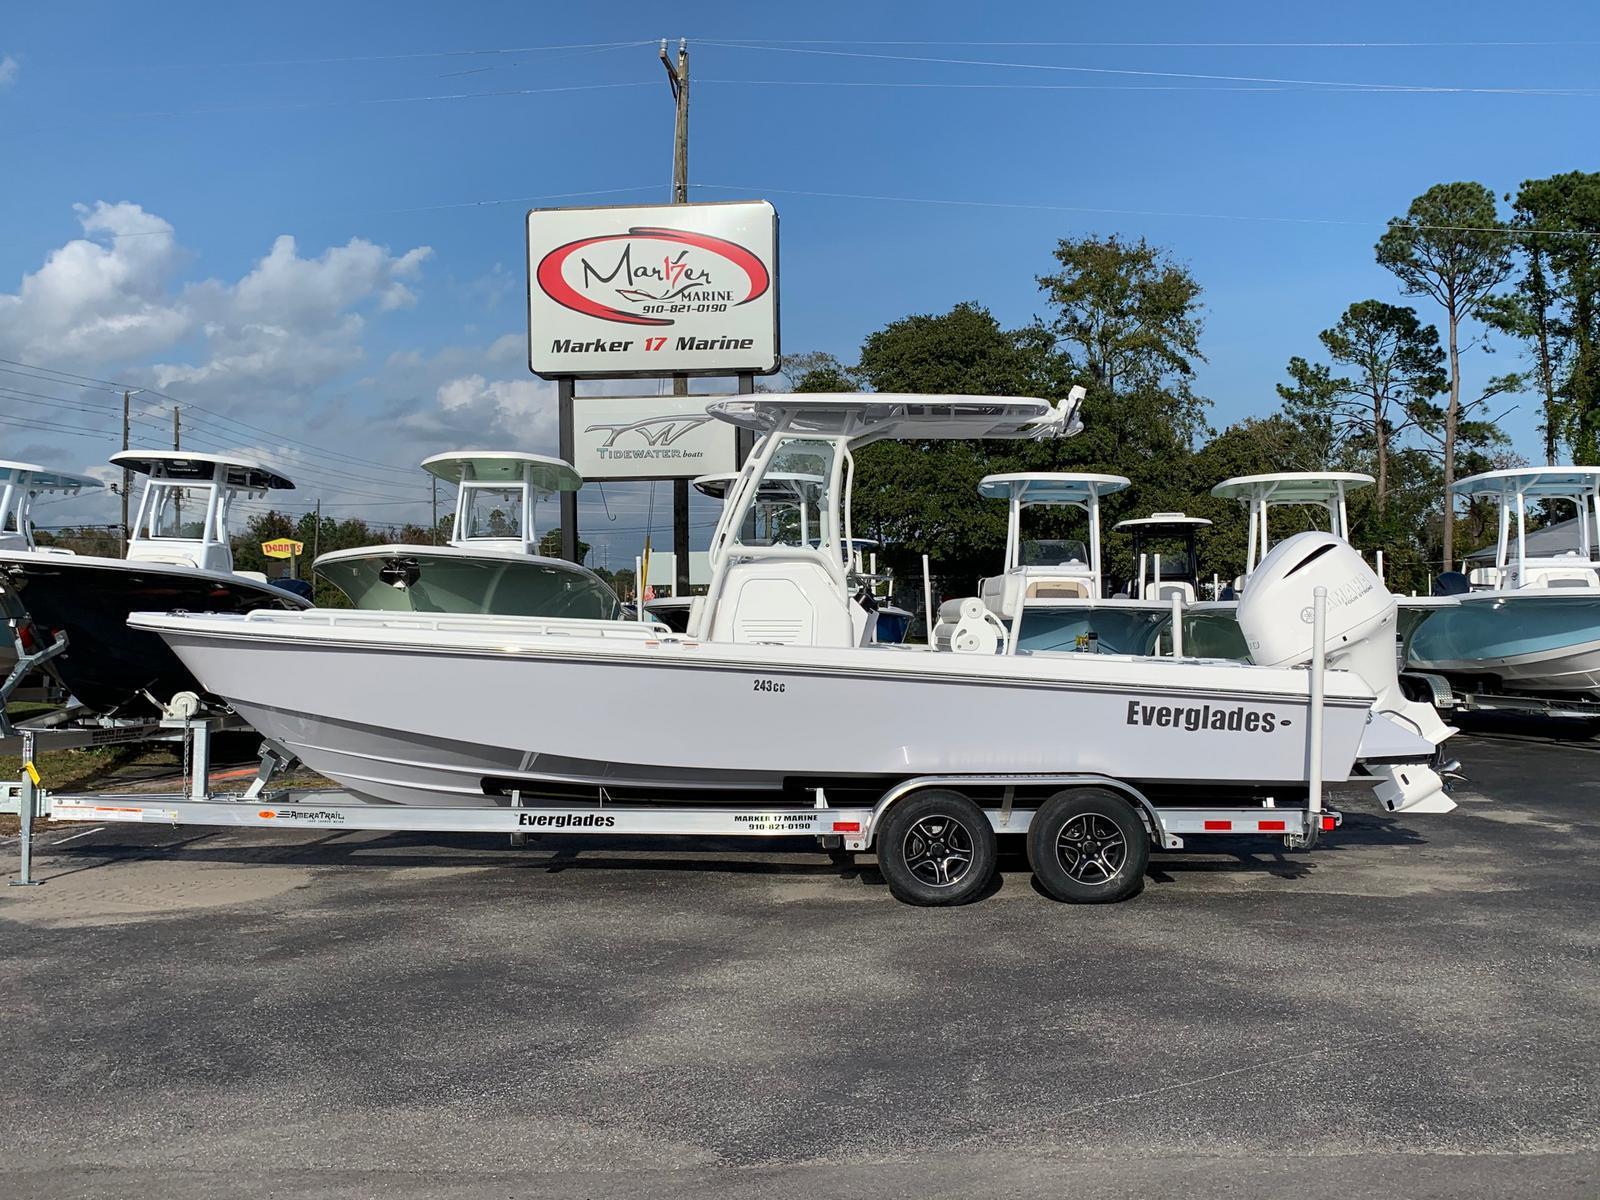 New Inventory Marker 17 Marine Wilmington Nc 910 821 0190